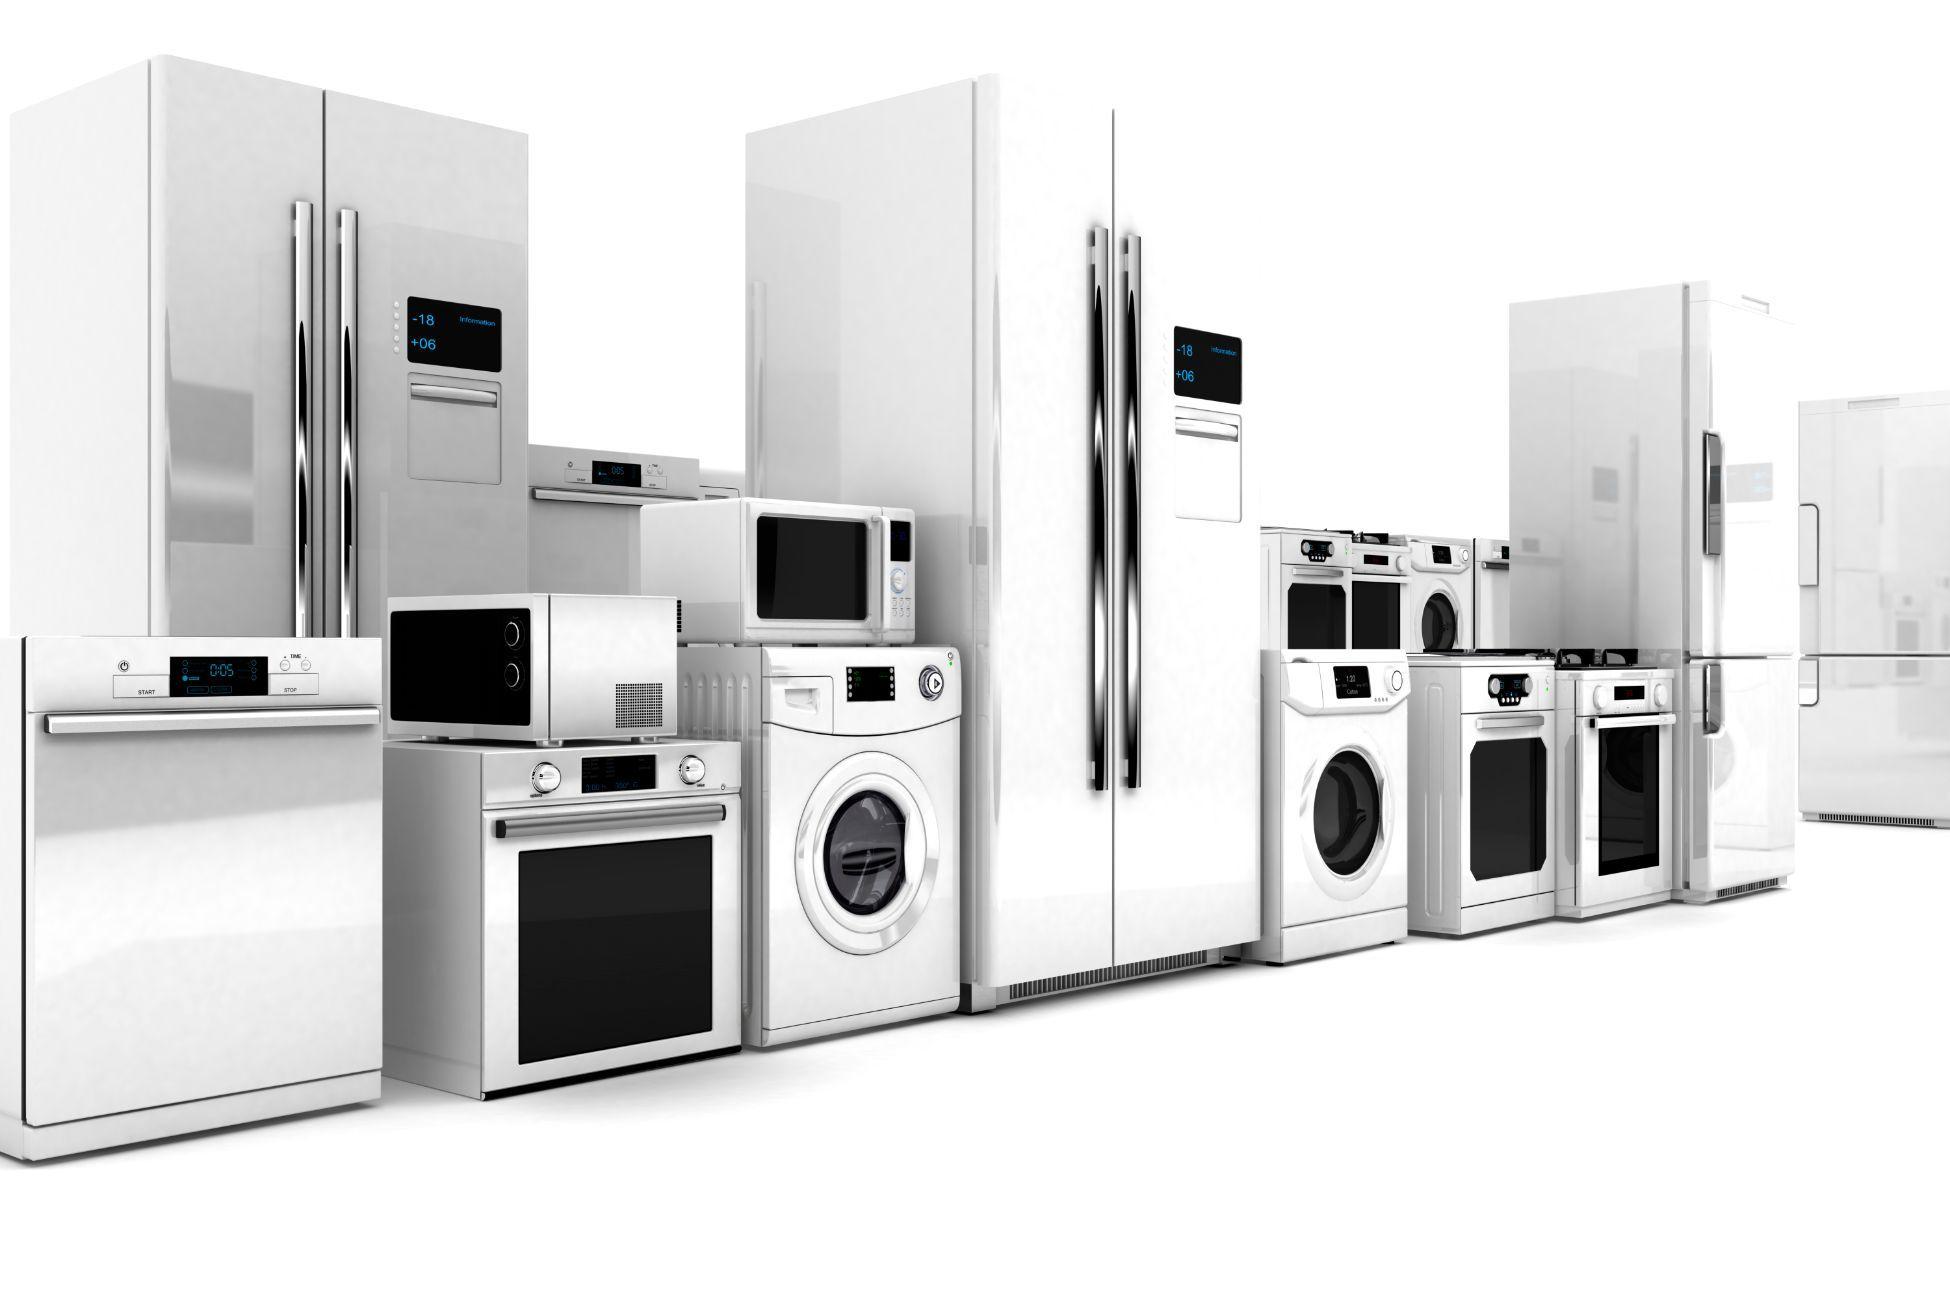 Foto 6 de Electrodomésticos (reparación) en  | Servicio Técnico Oficial Samsung LG Candy Otsein